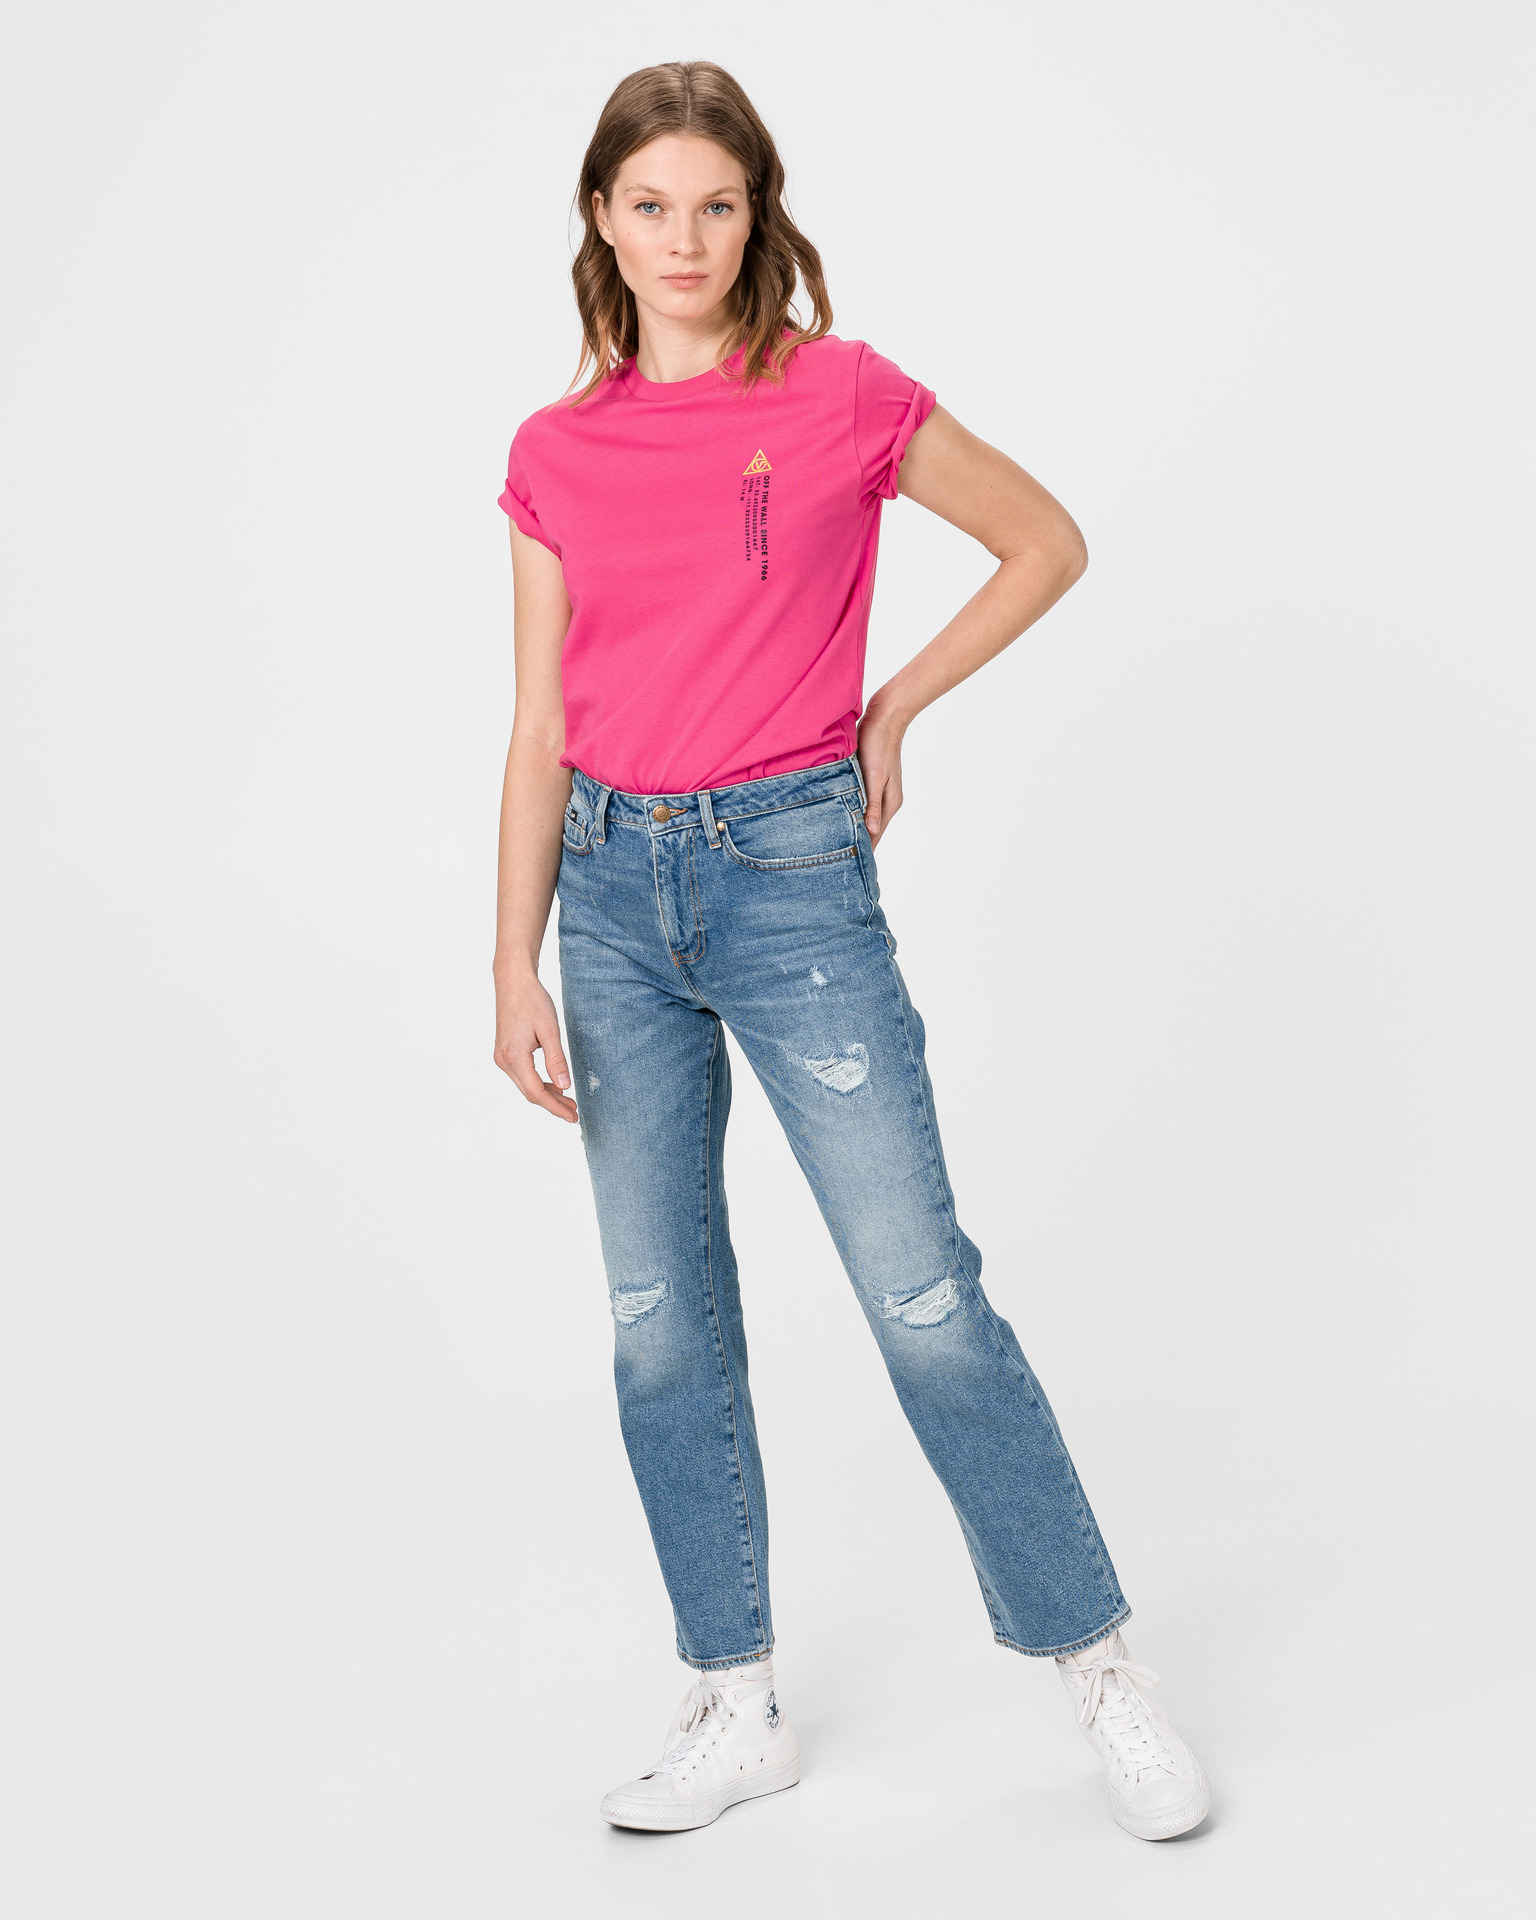 Vans roz tricou 66 Supply